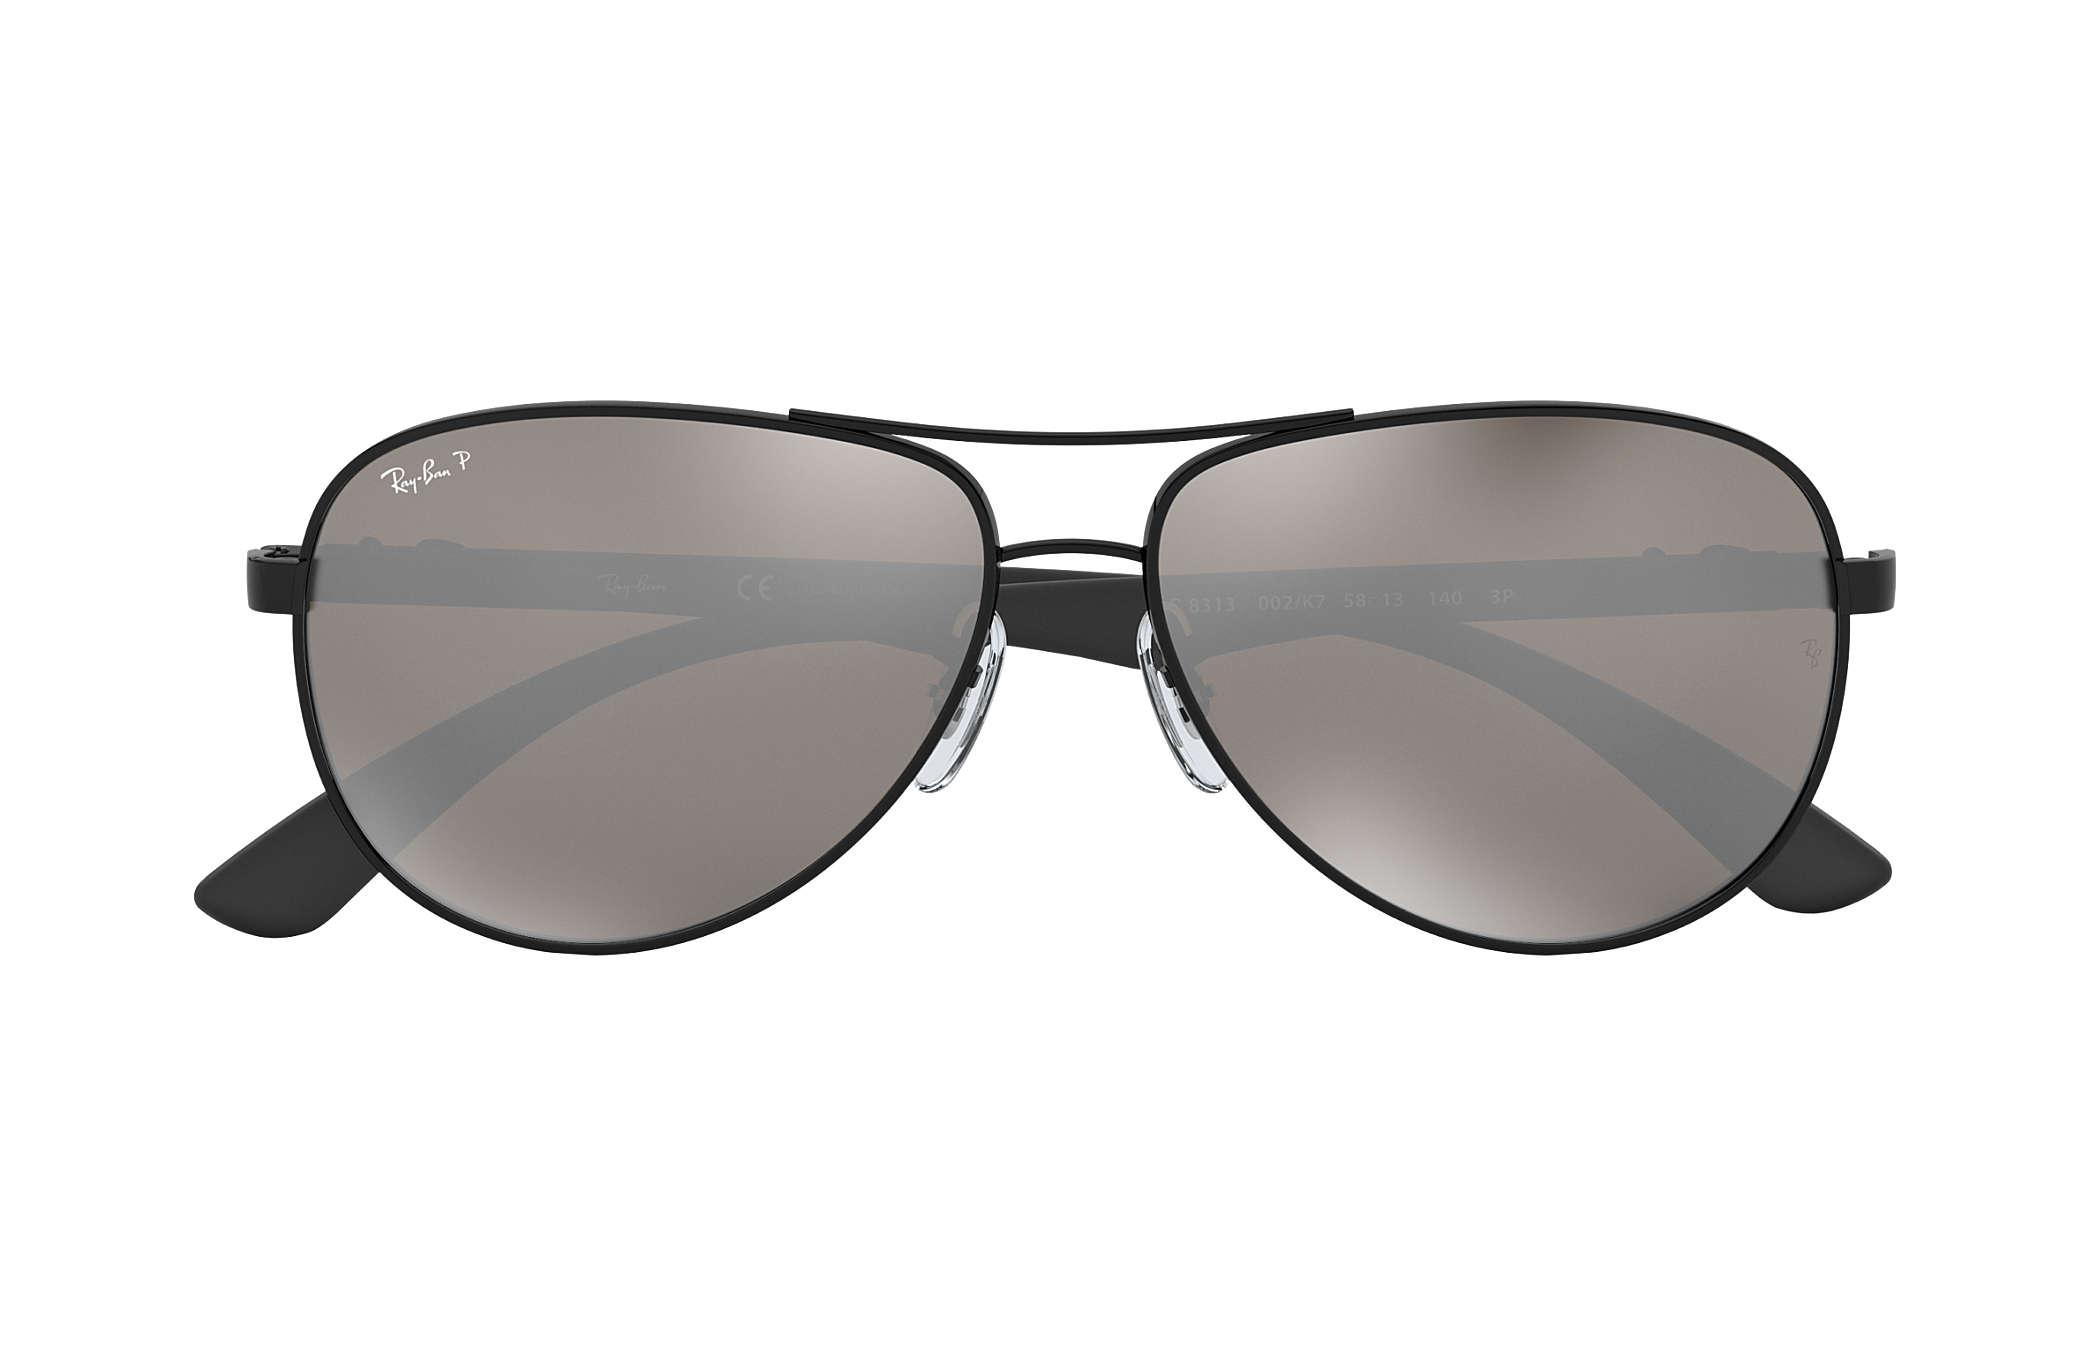 f490fd2c262 Ray-Ban RB8313 Black - Carbon Fibre - Grey Polarized Lenses ...